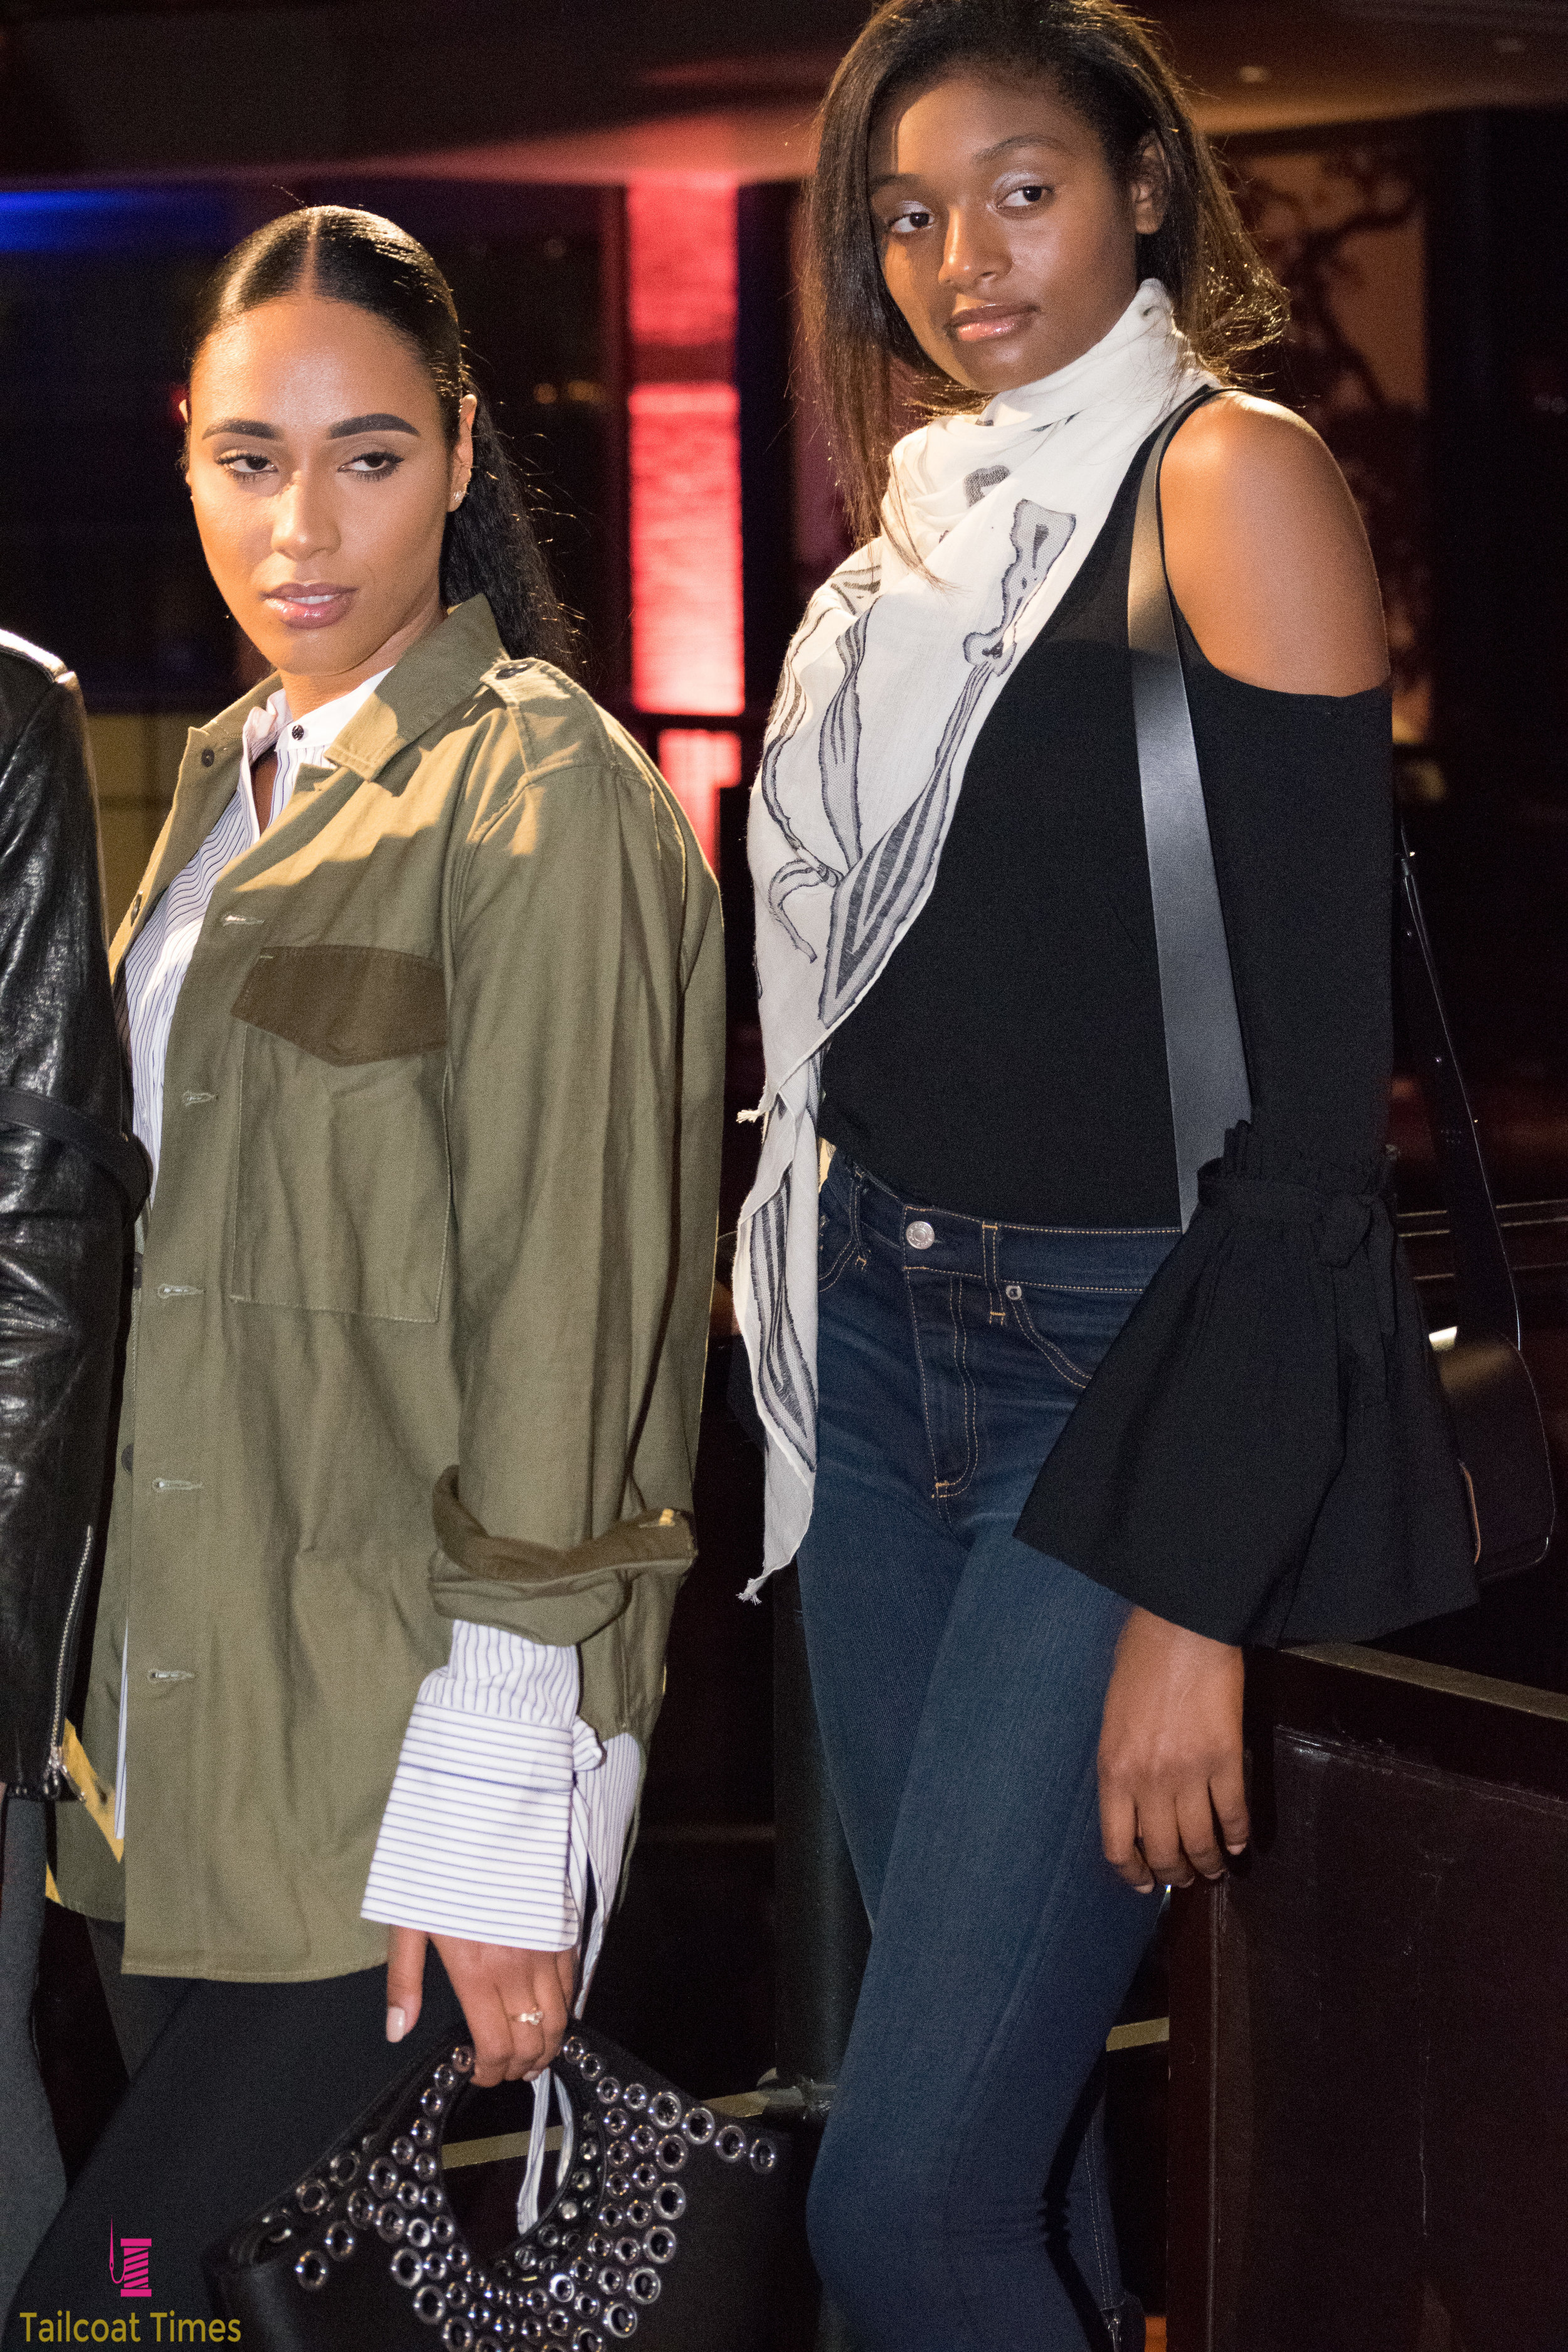 FashionablyLate_TrunkShow_Tailcoat Times (48 of 48).jpg